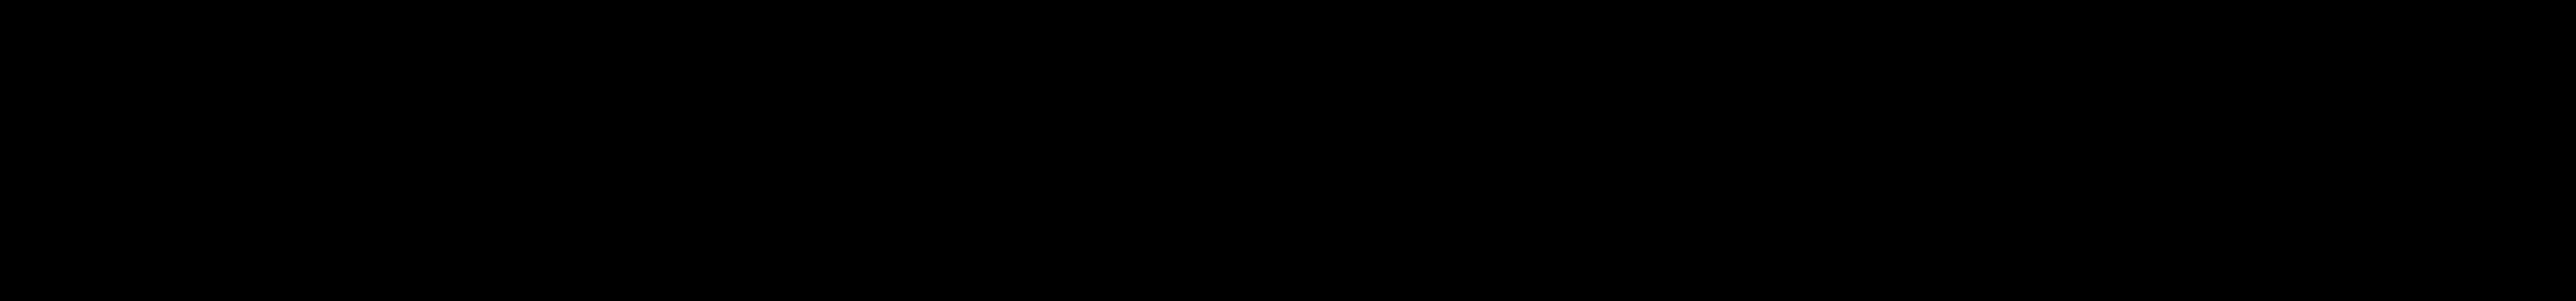 logo De Gezonde Stad Amsterdam